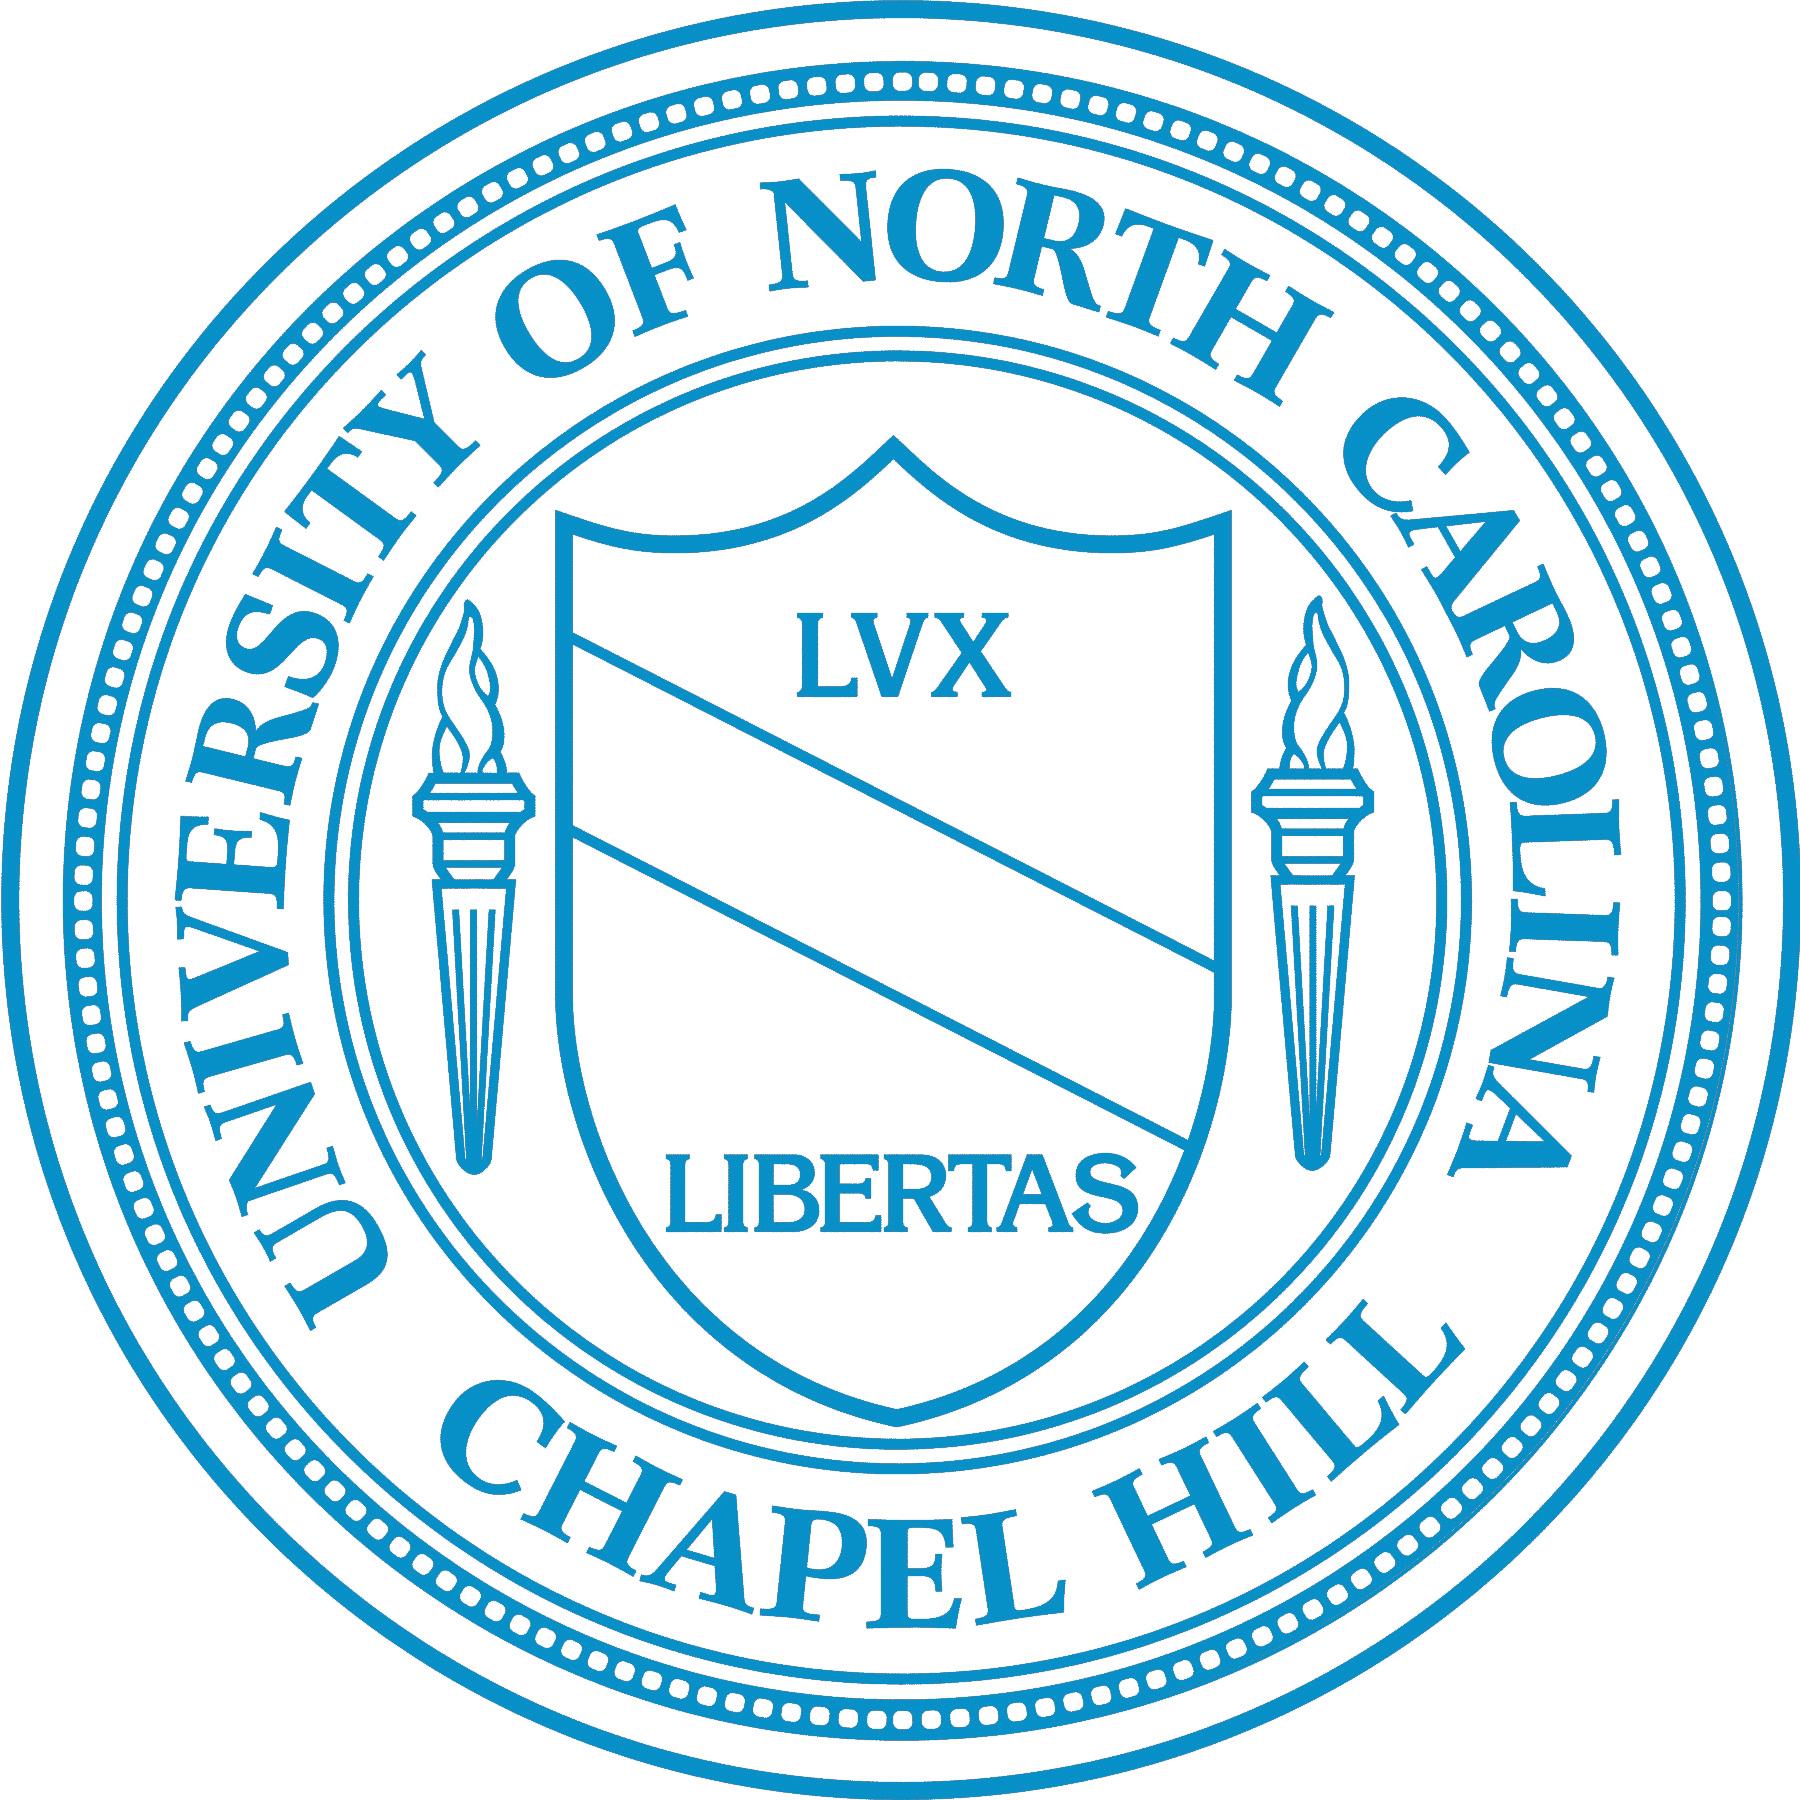 University of North Carolina School of Law